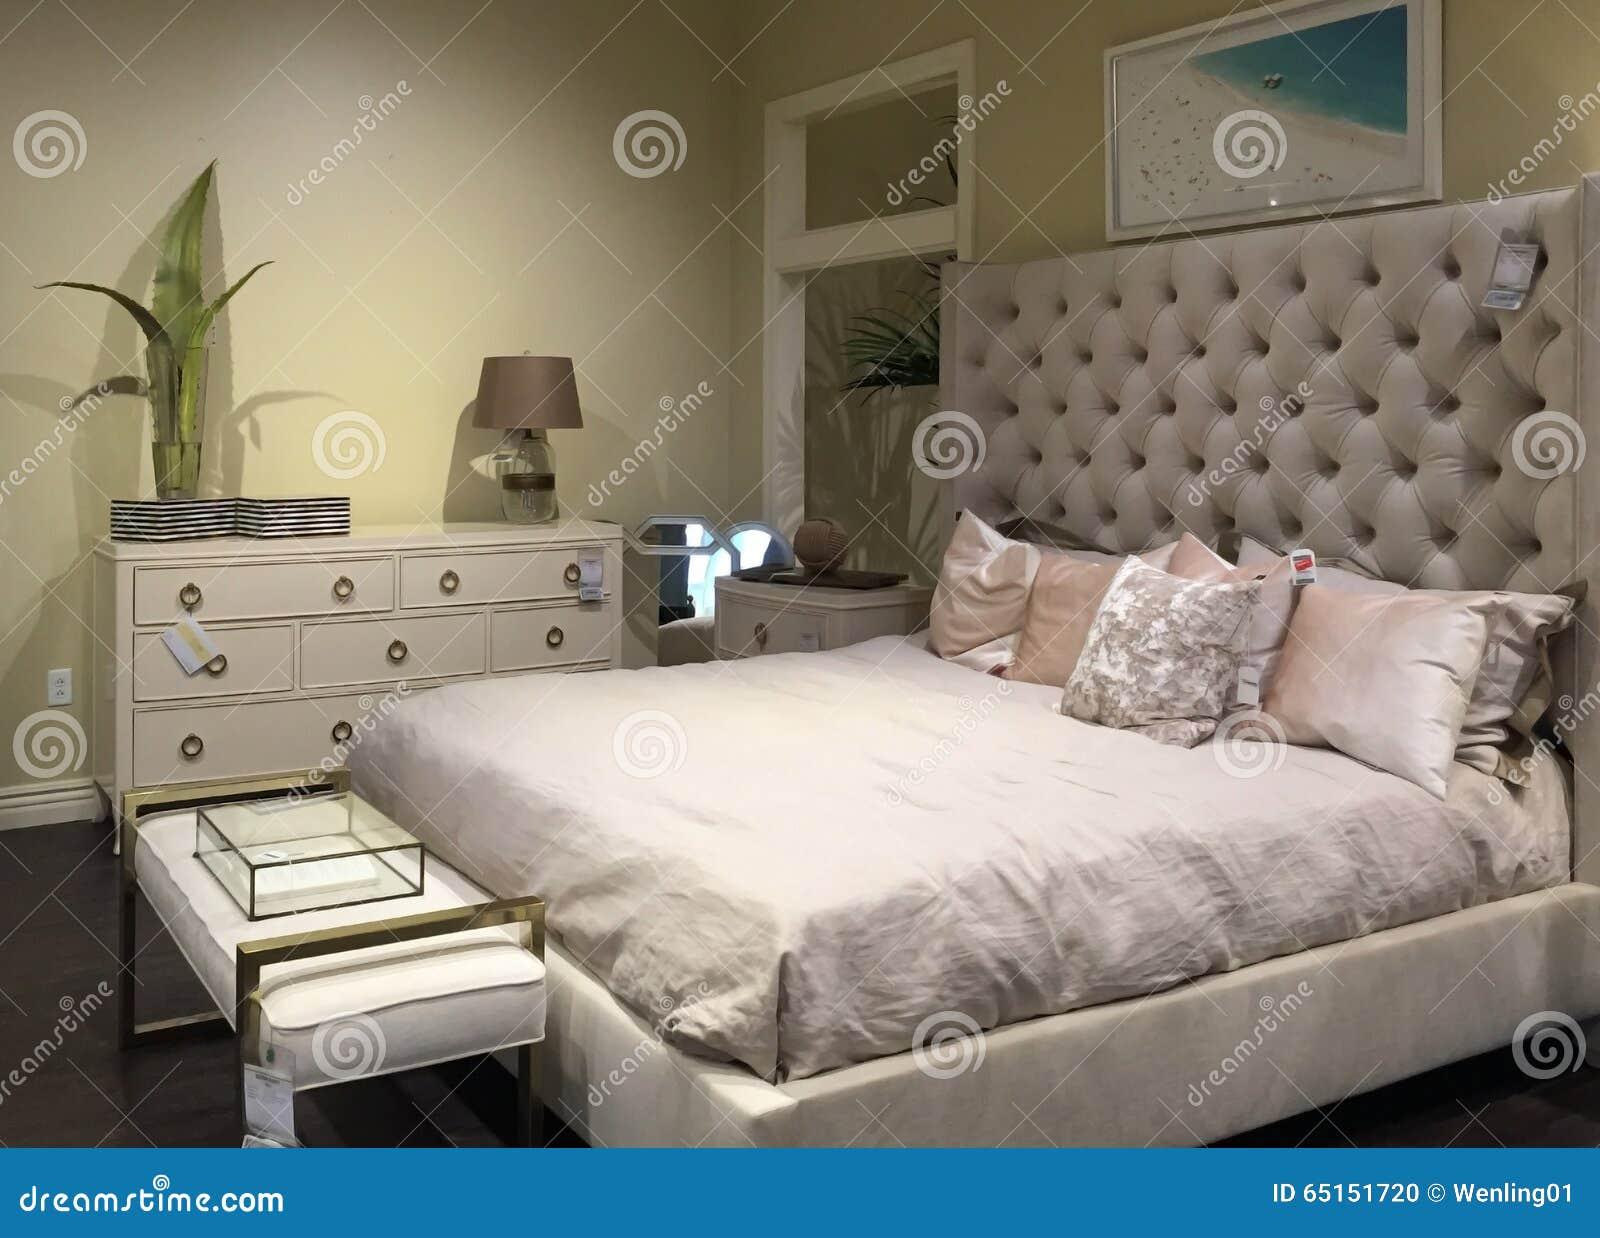 Selling Bedroom Furniture Nice Modern Bedroom Furniture Selling Editorial Image Image